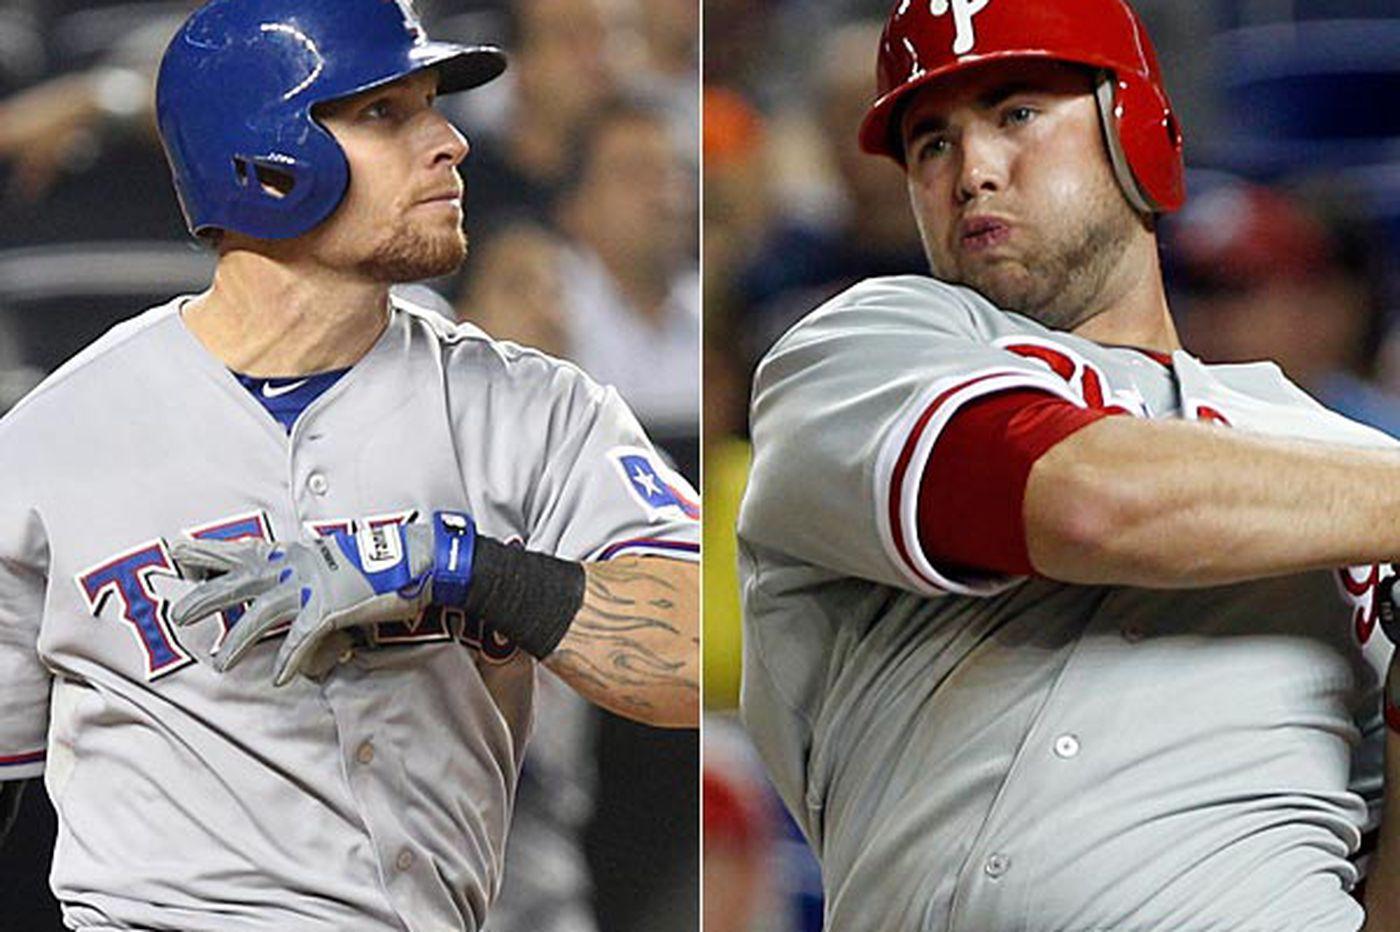 Inside the Phillies: Phillies outfield could pair Josh Hamilton, Darin Ruf